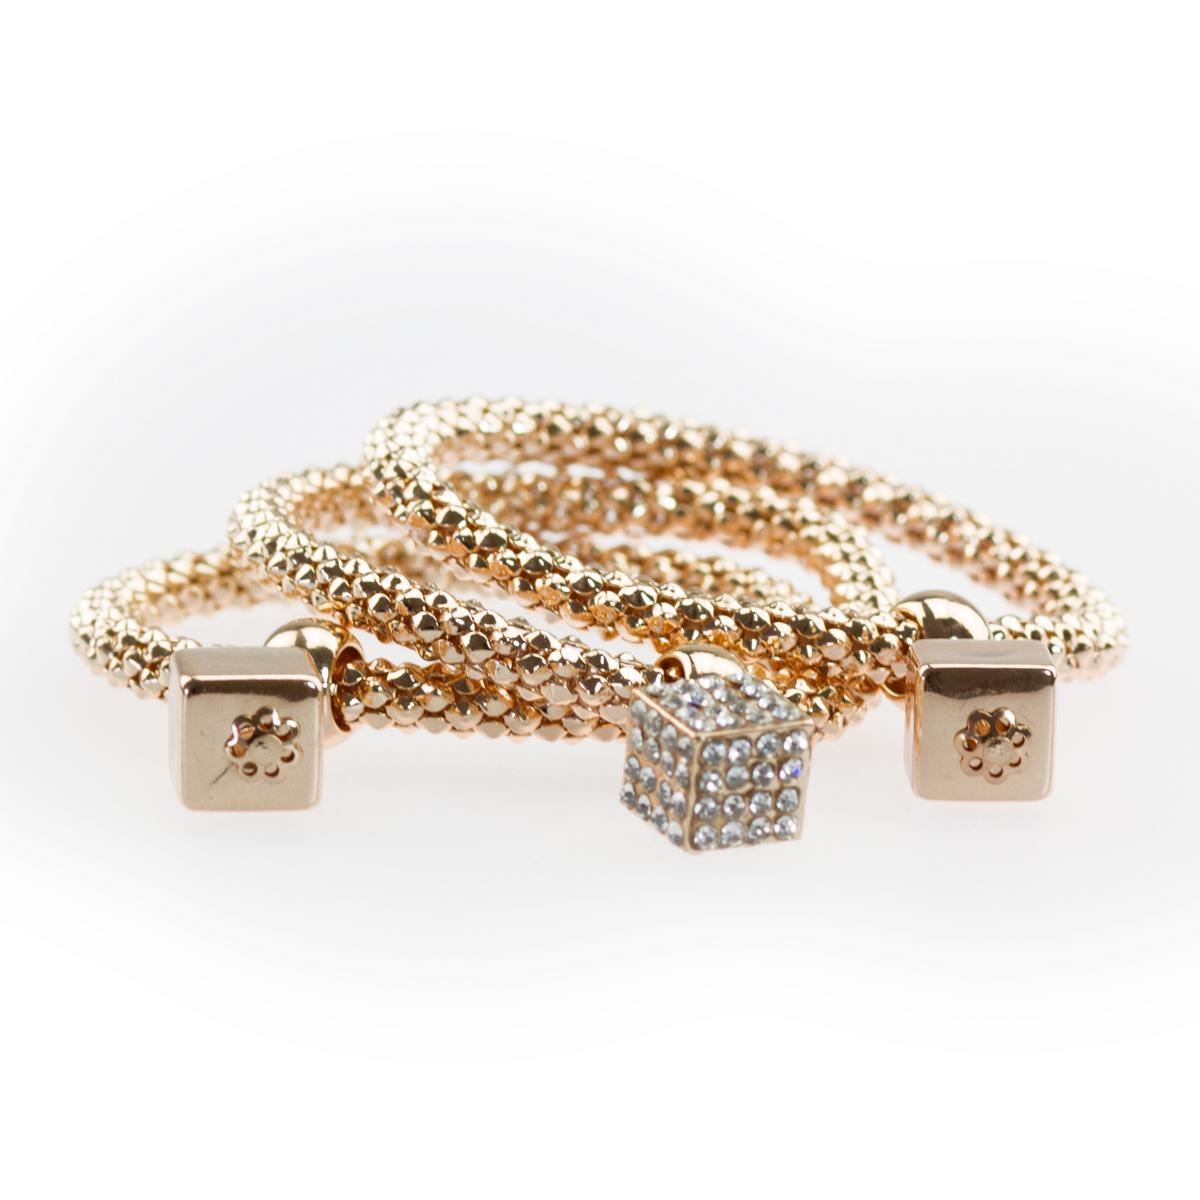 3 teiliges damen armband s09 w rfel gold strass anh nger